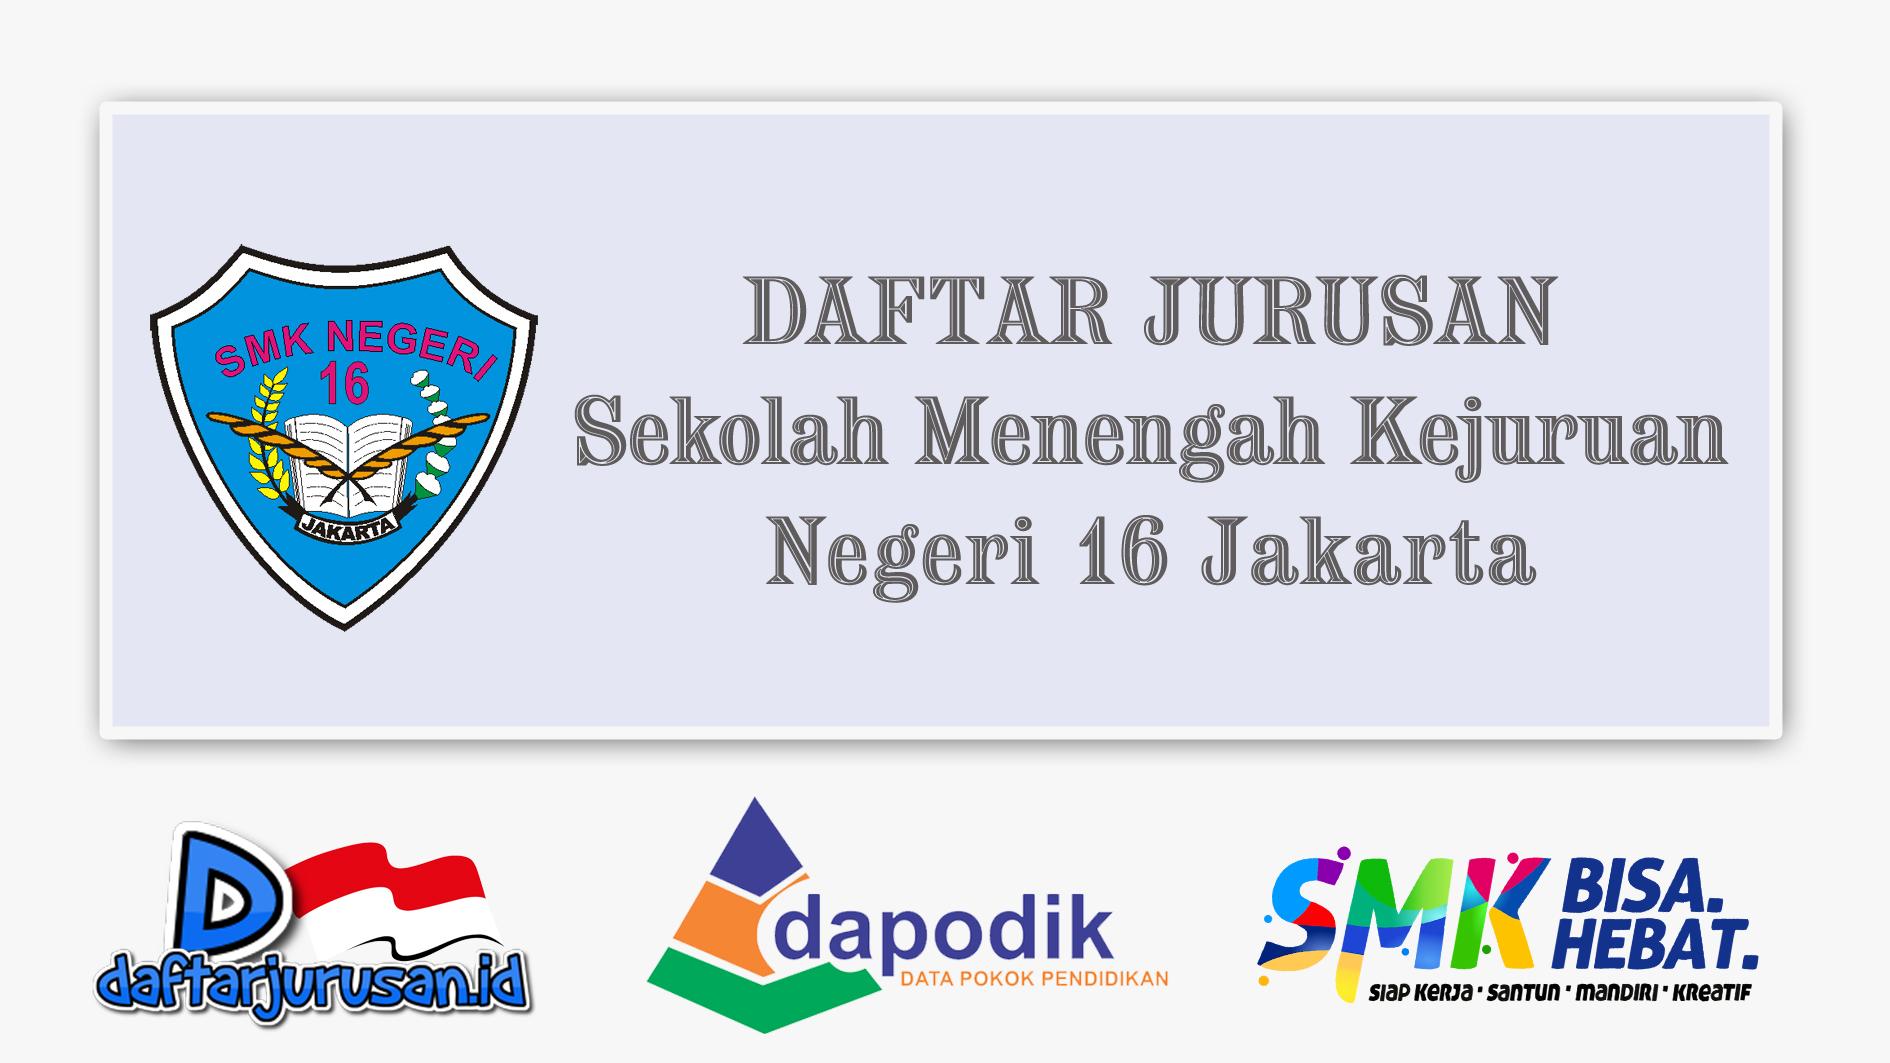 Daftar Jurusan SMK Negeri 16 Jakarta Pusat